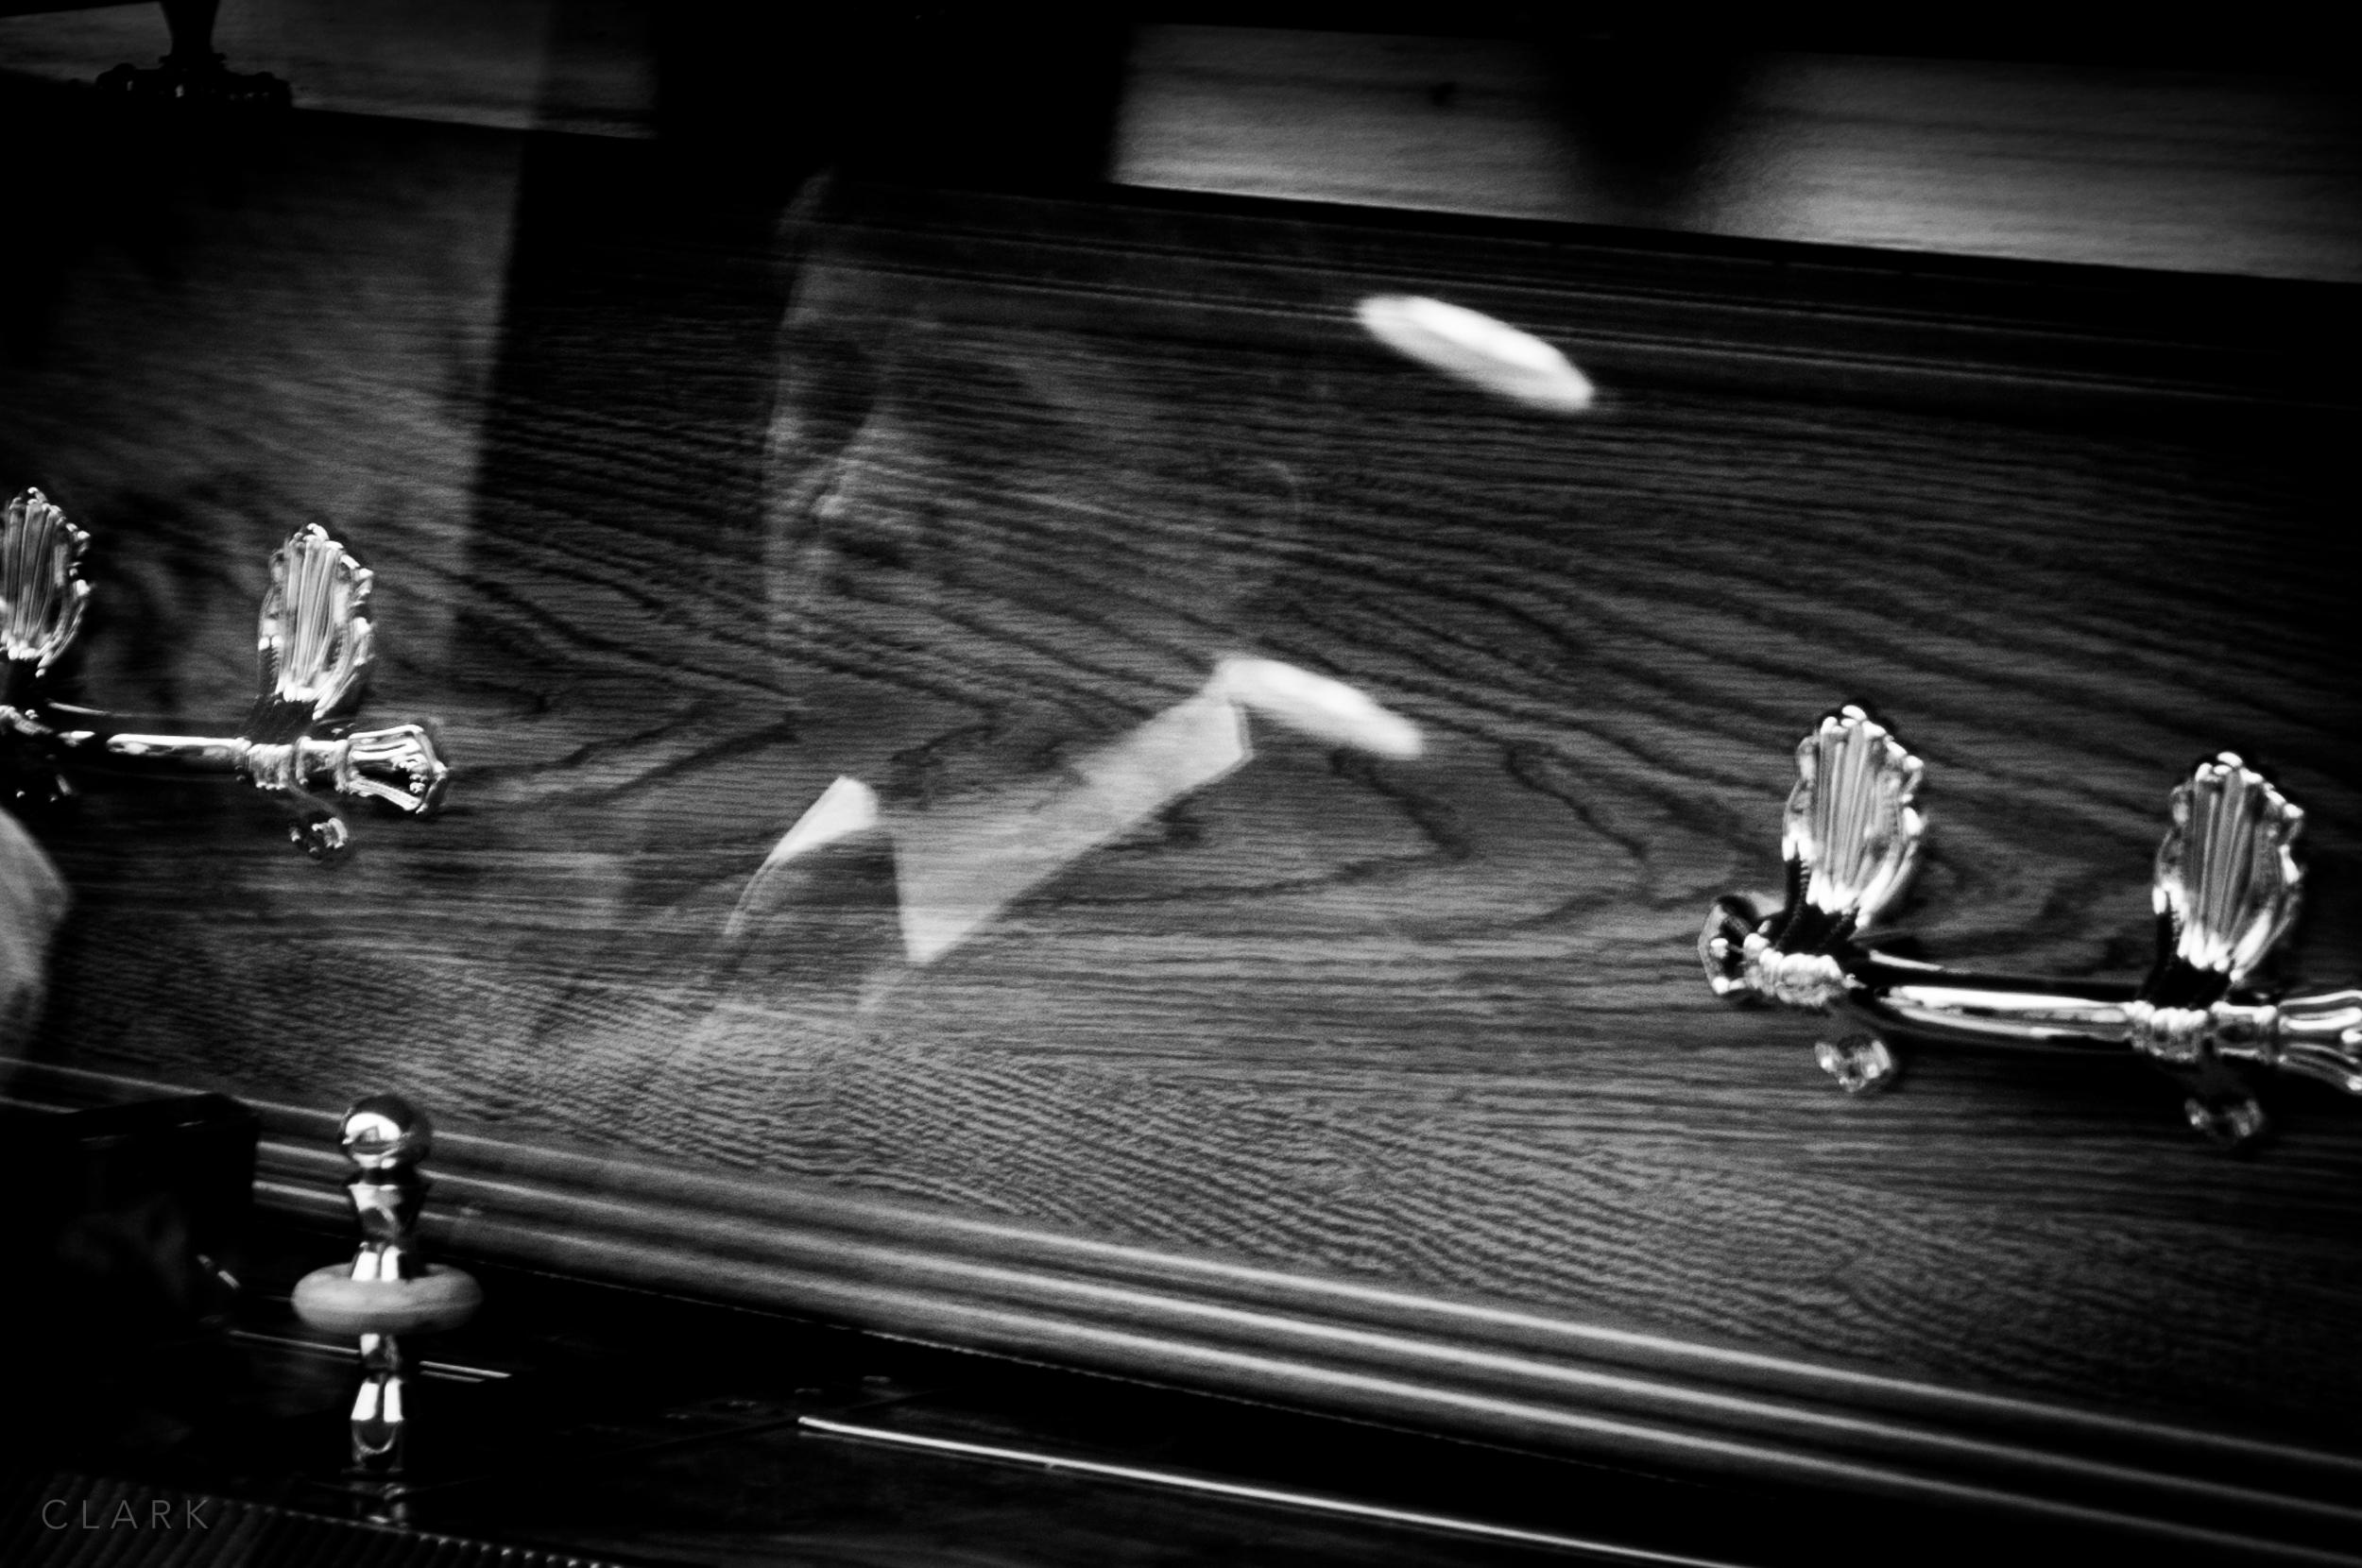 012_DerekClarkPhoto-Documentary.jpg